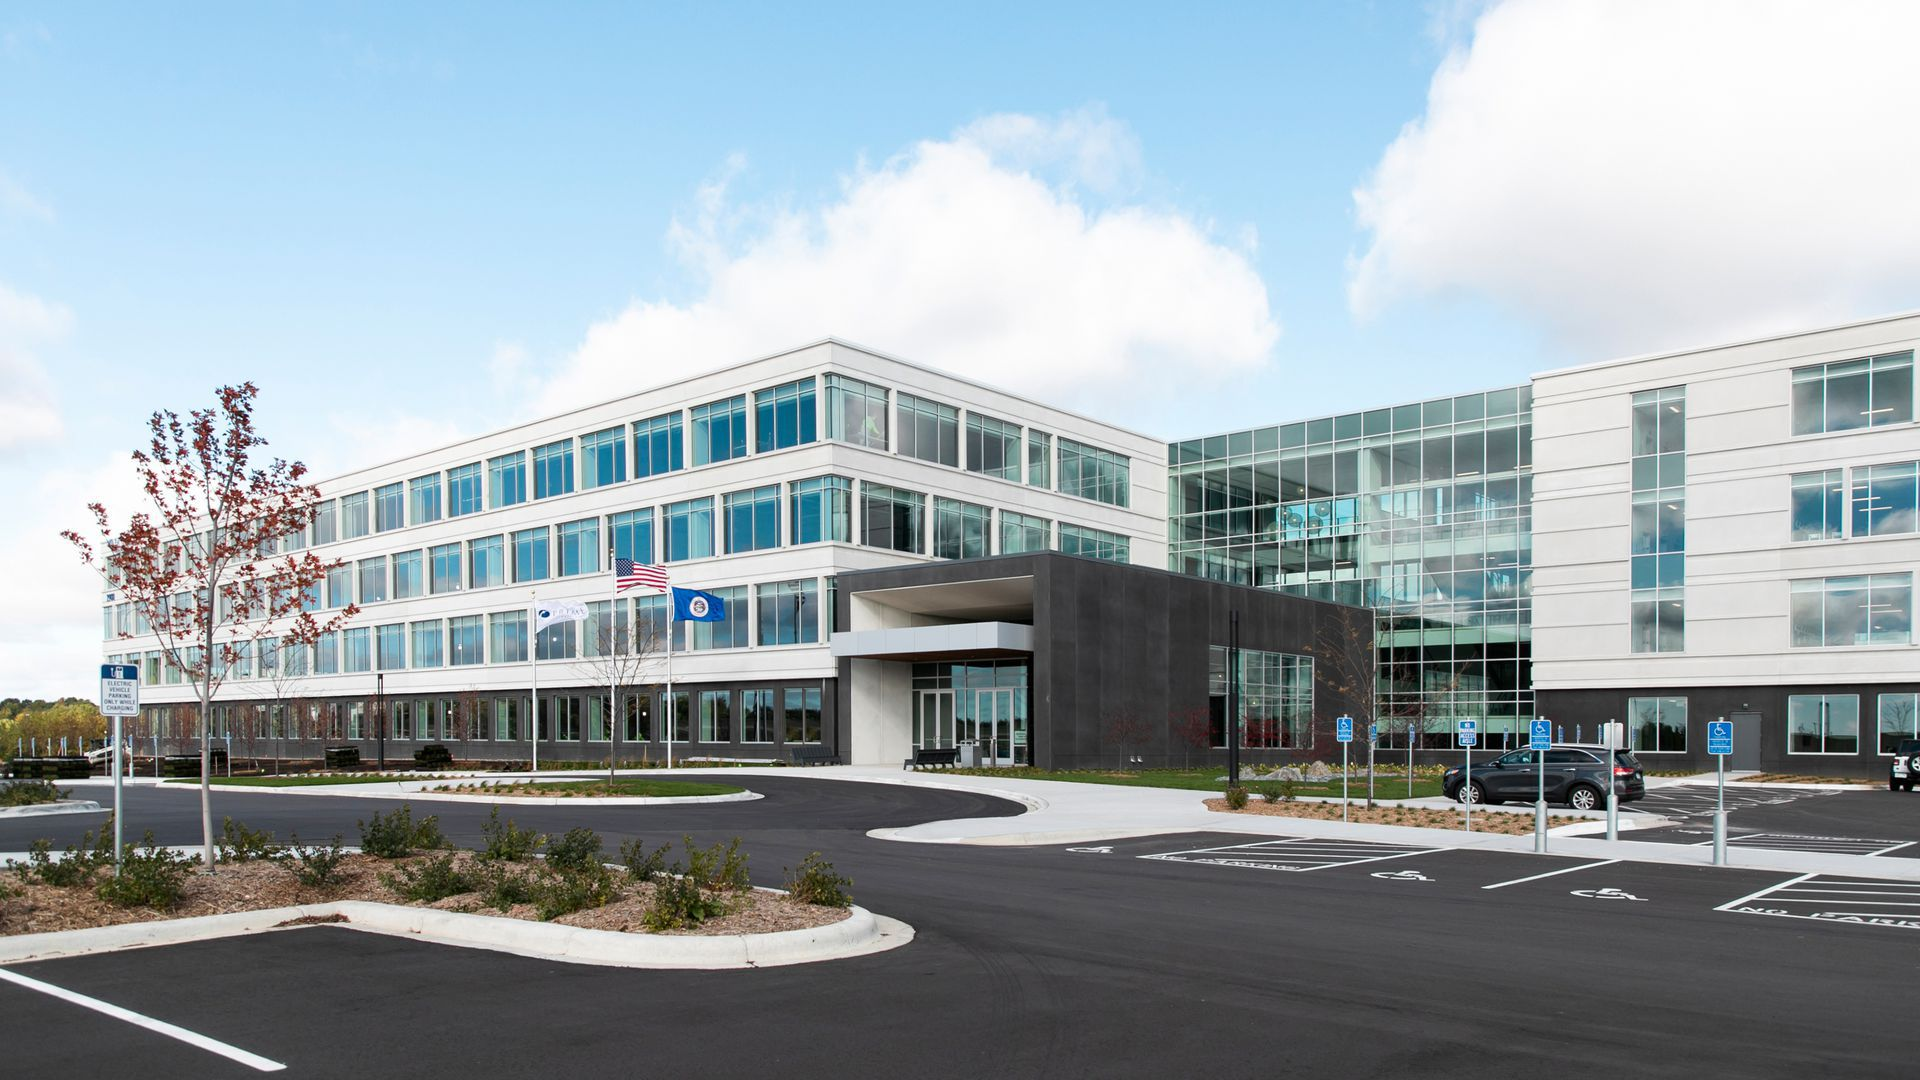 Prime Therapeutics' office in Eagan, Minnesota